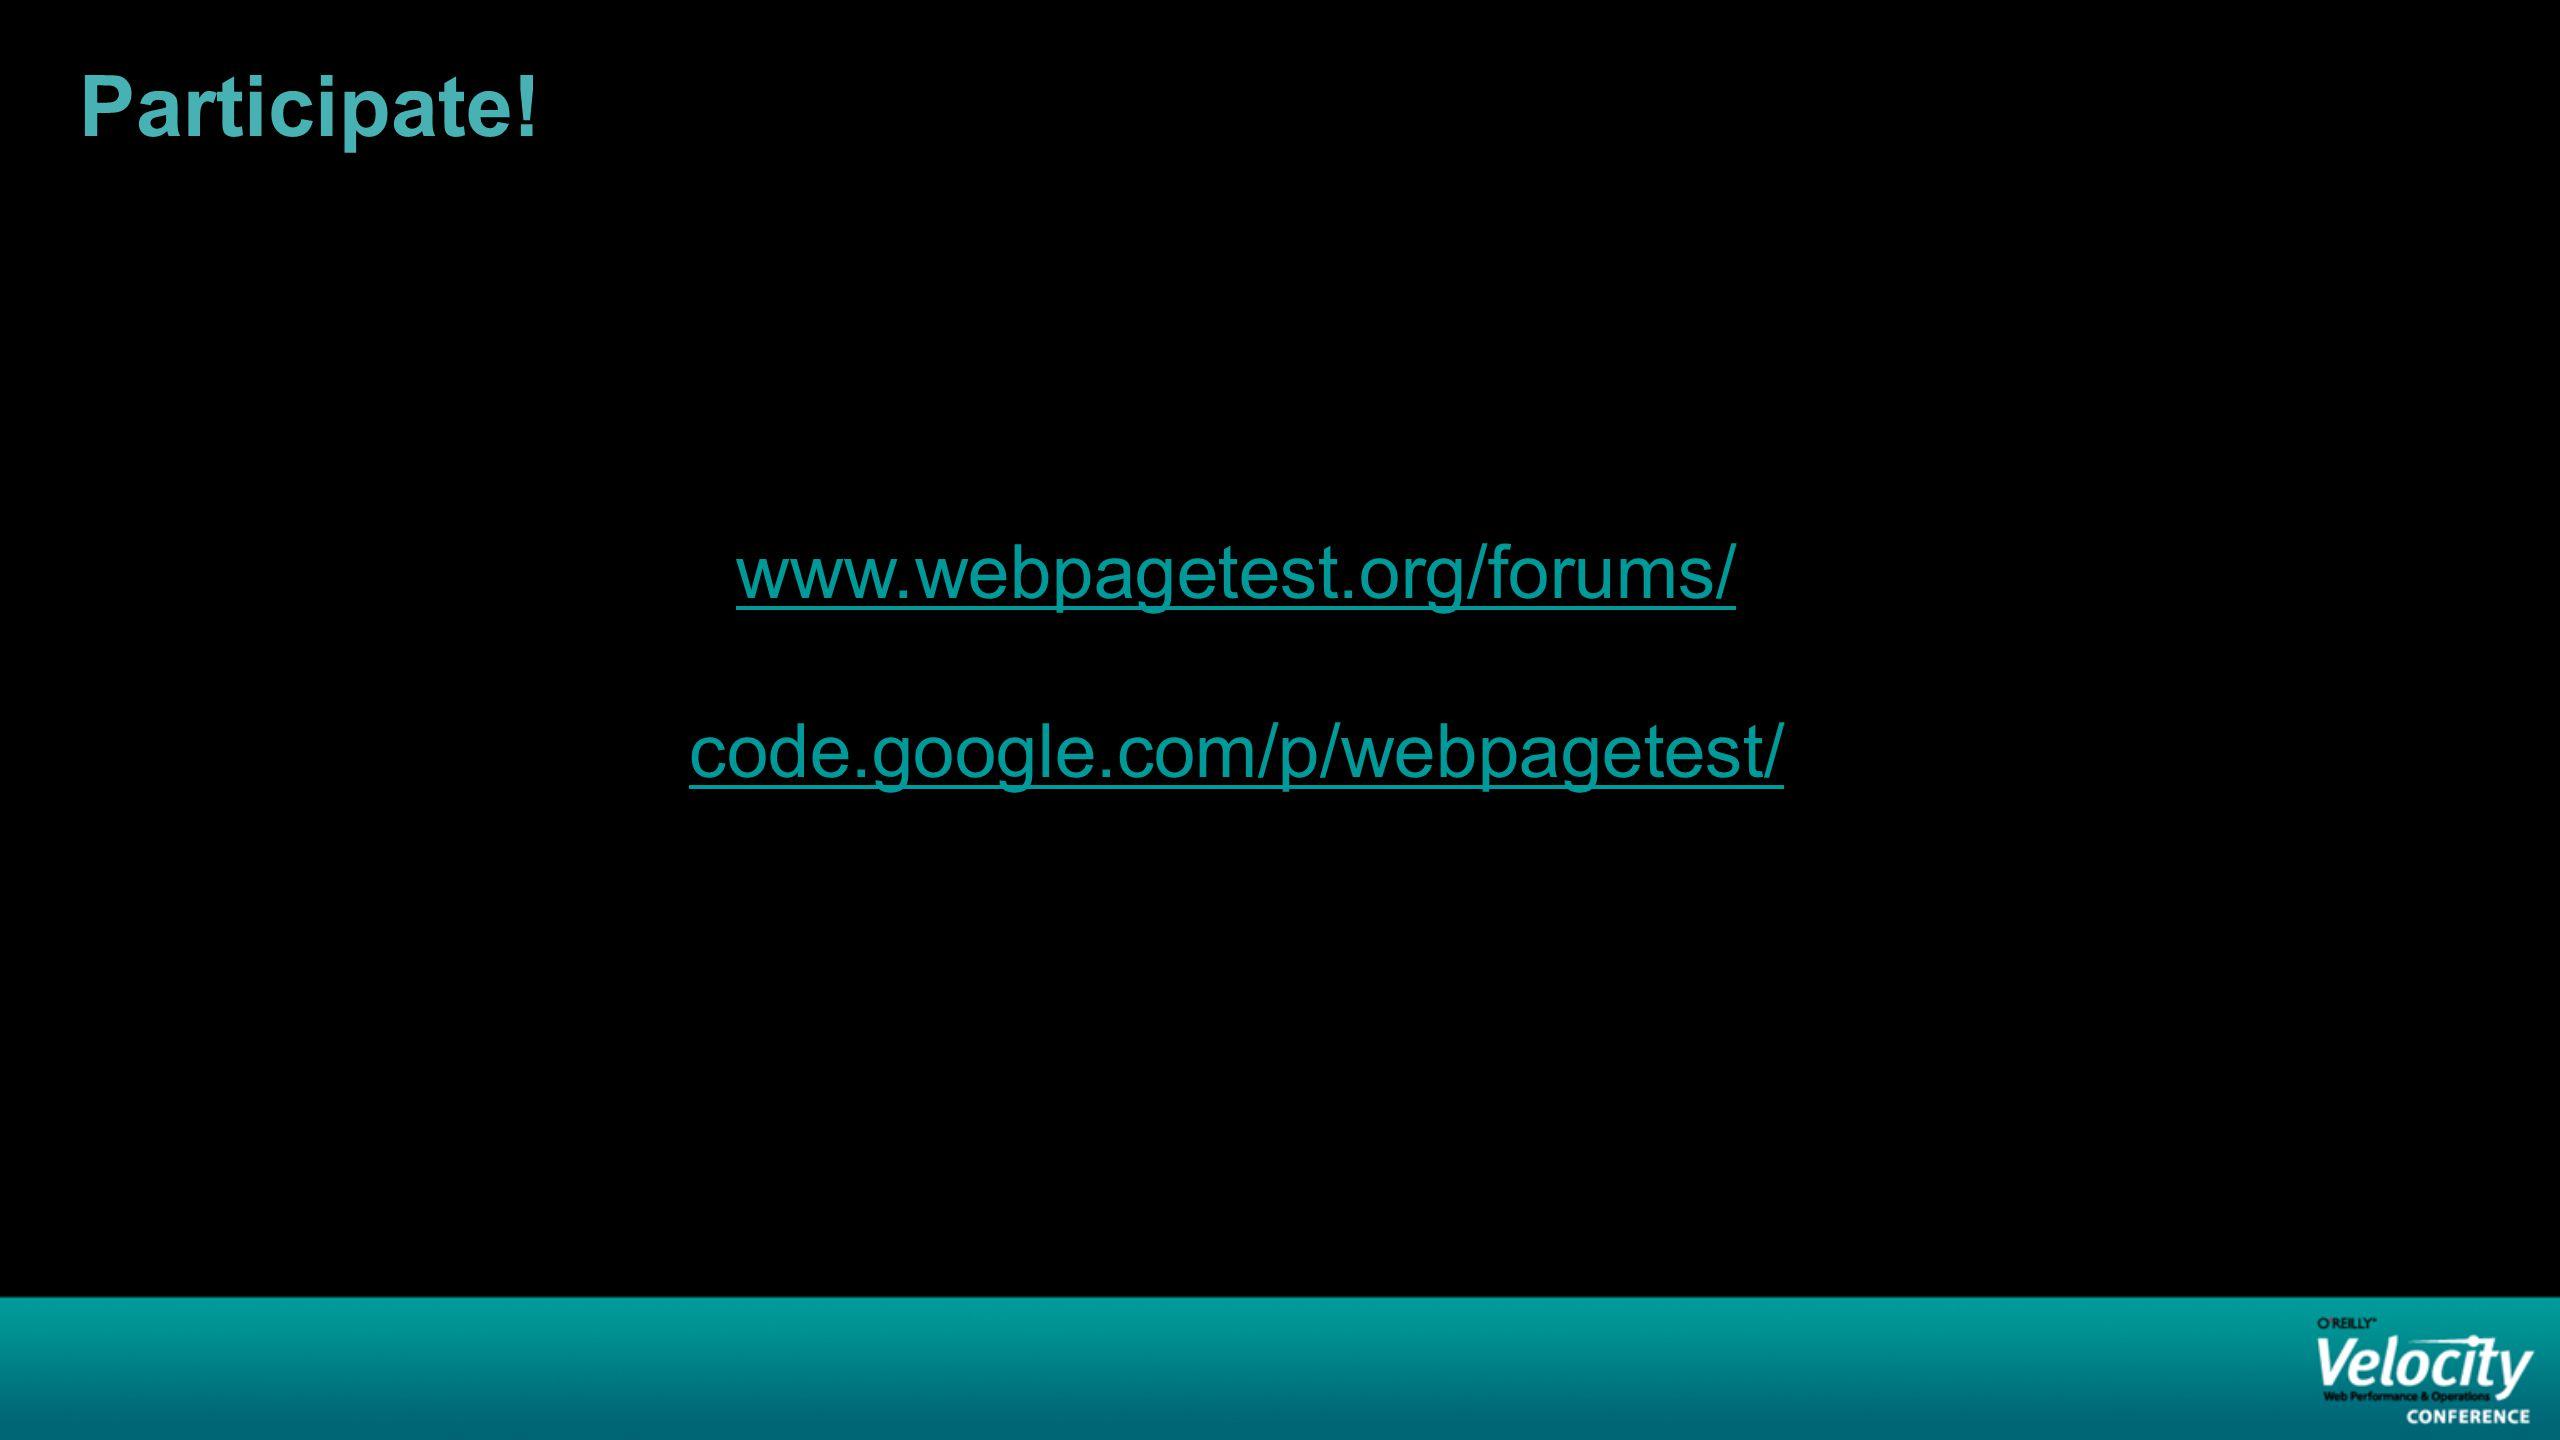 Participate! www.webpagetest.org/forums/ code.google.com/p/webpagetest/